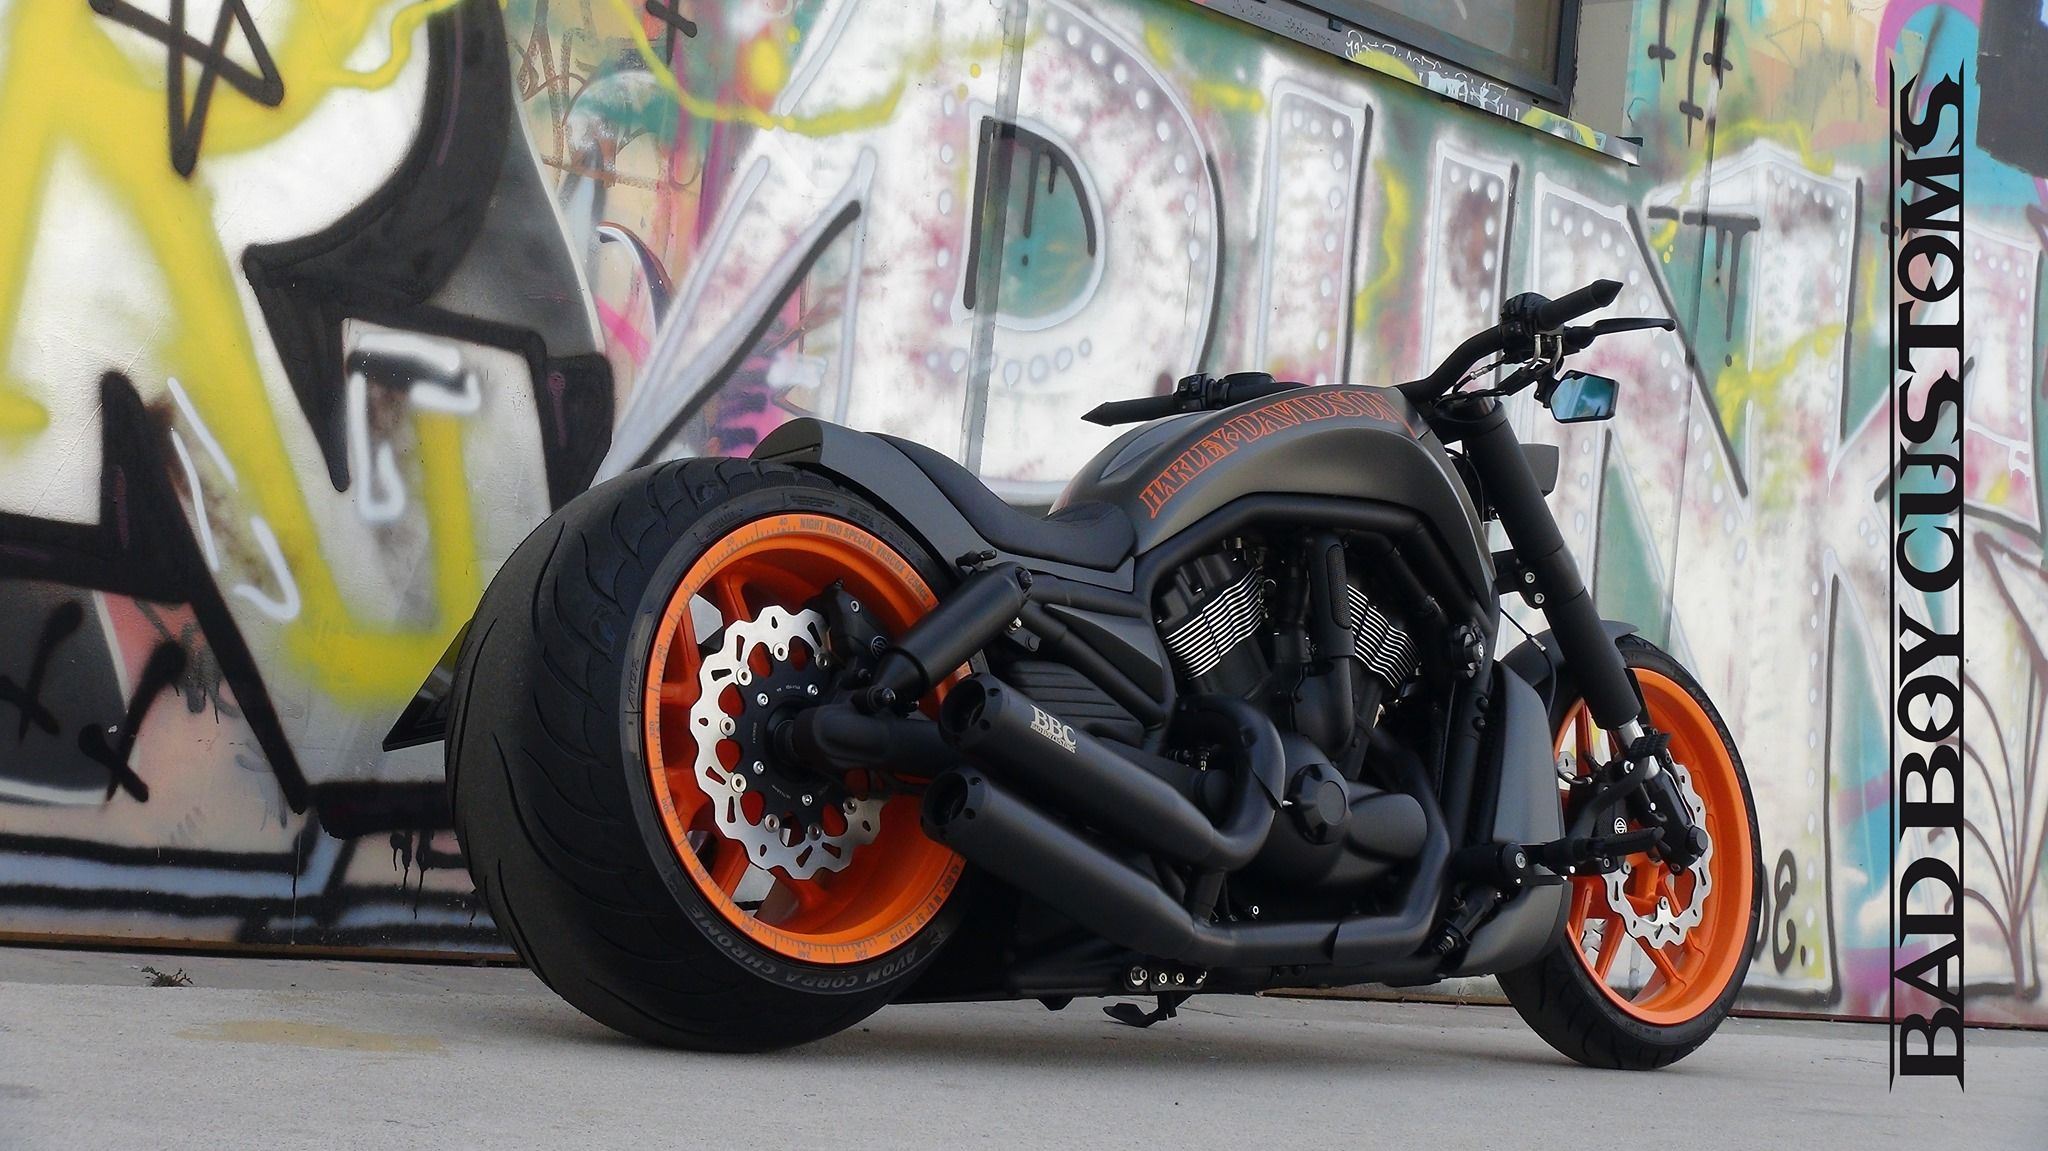 Harley Davidson Vrscdx Night Rod Special Custom By Bbc In 2020 Night Rod Special Harley Davidson Harley Davidson Night Rod